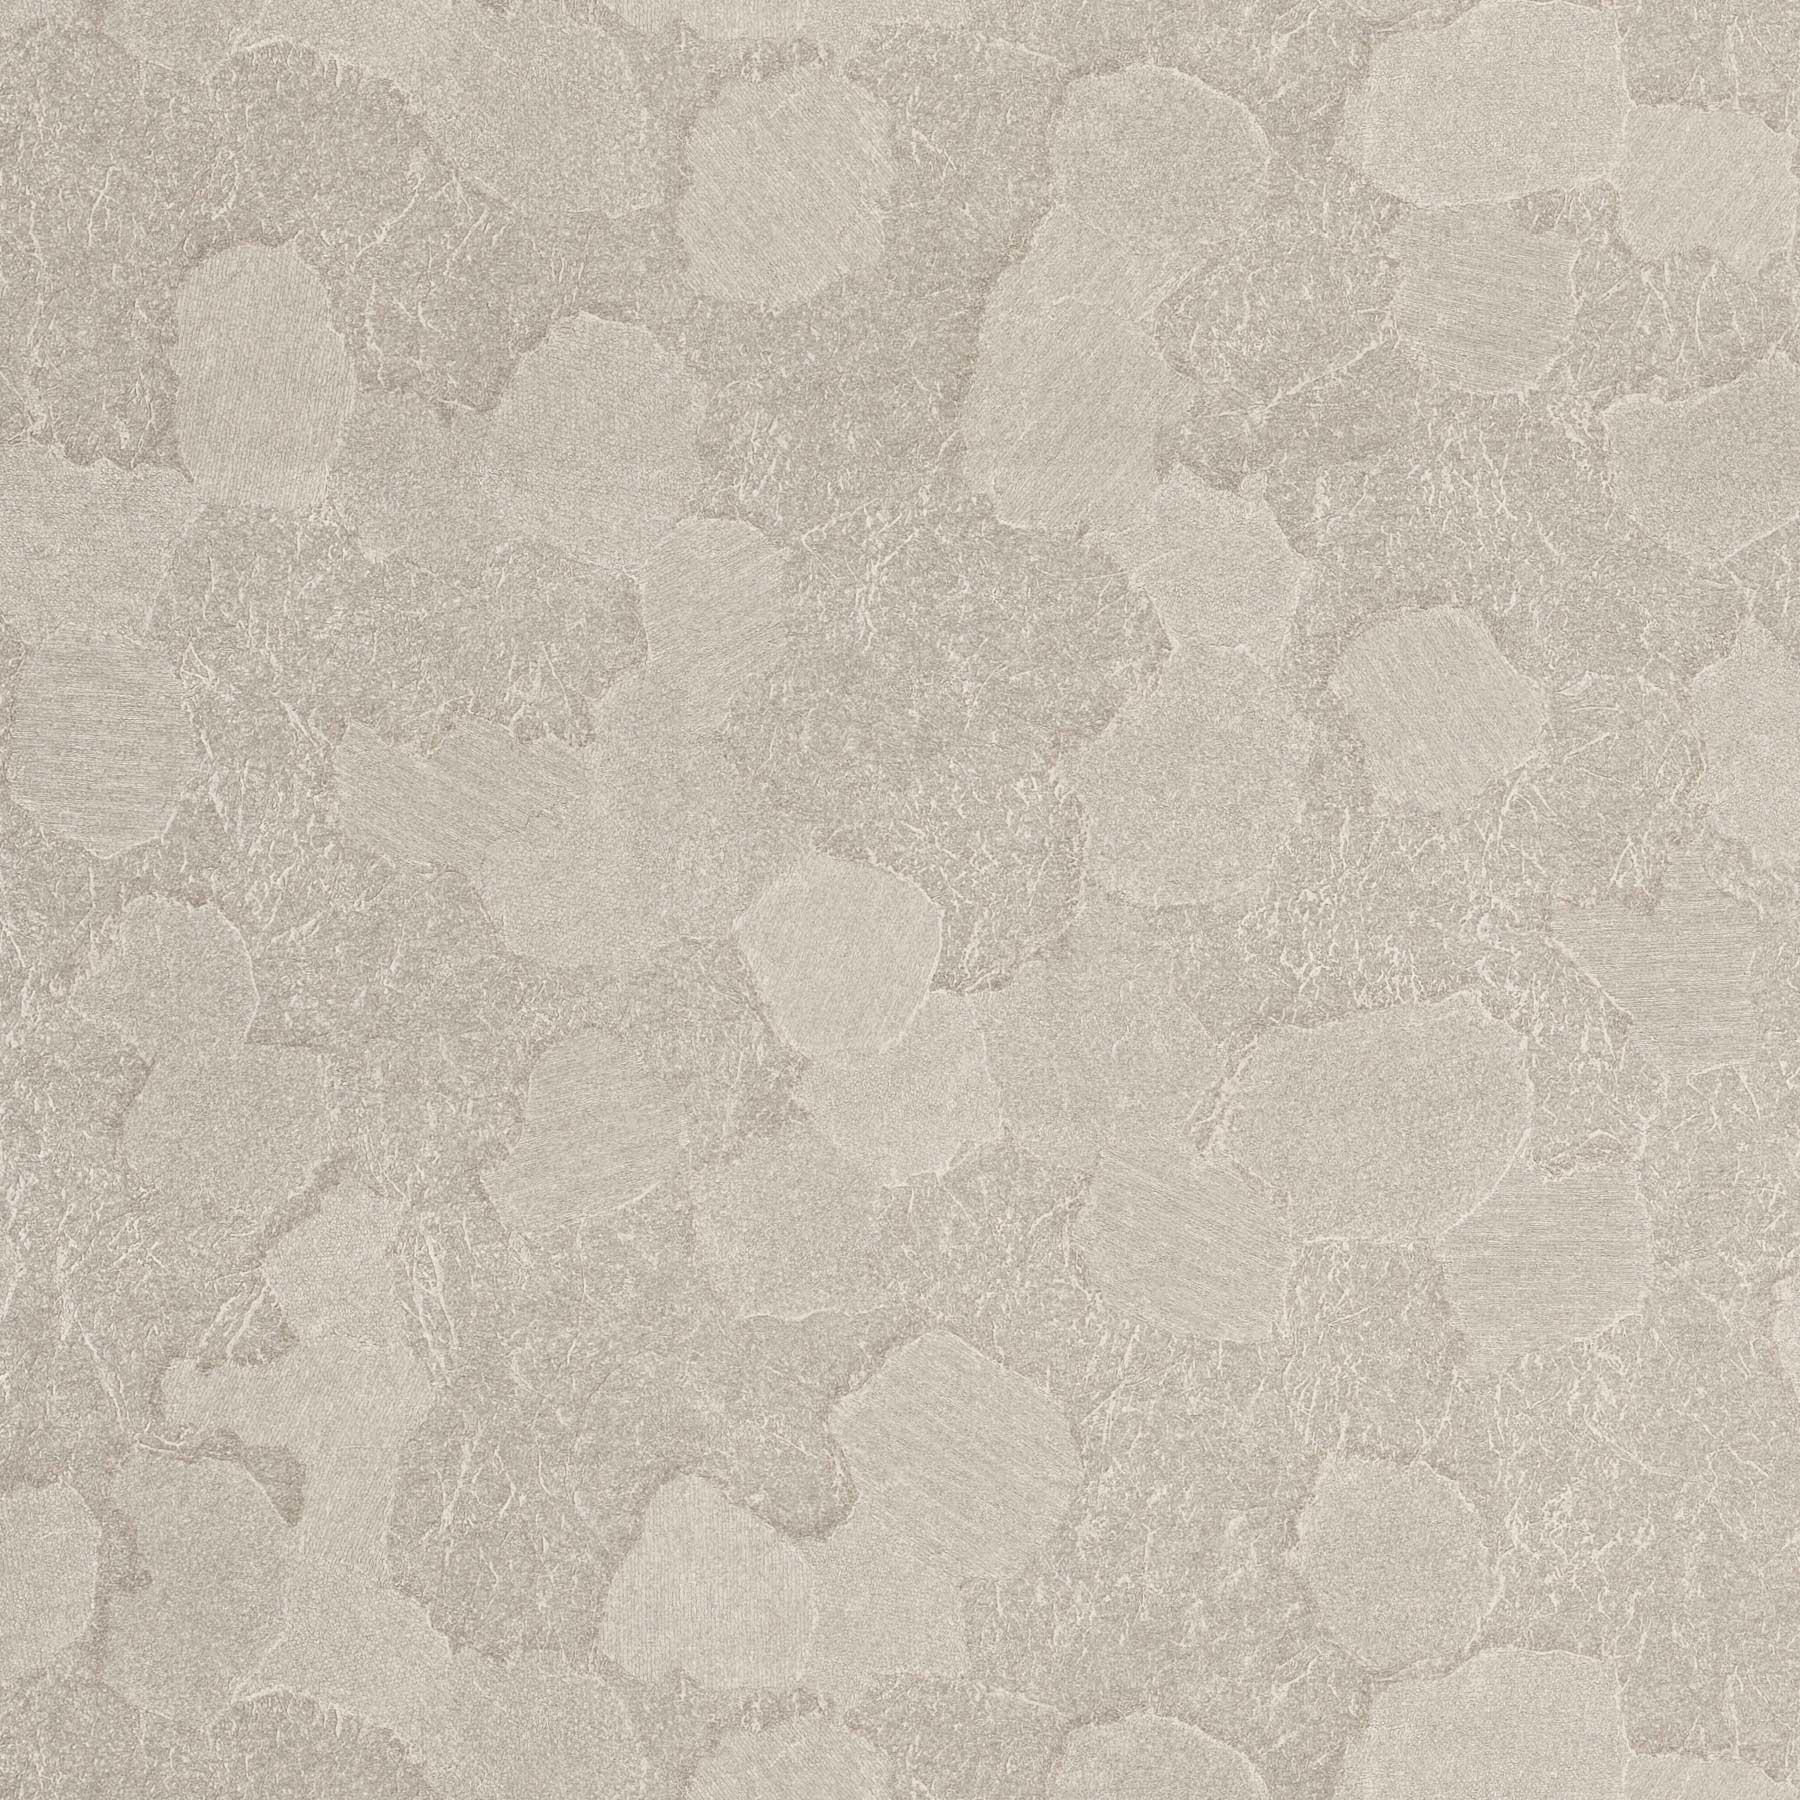 Maler Buban – Tapete DOME / JAB